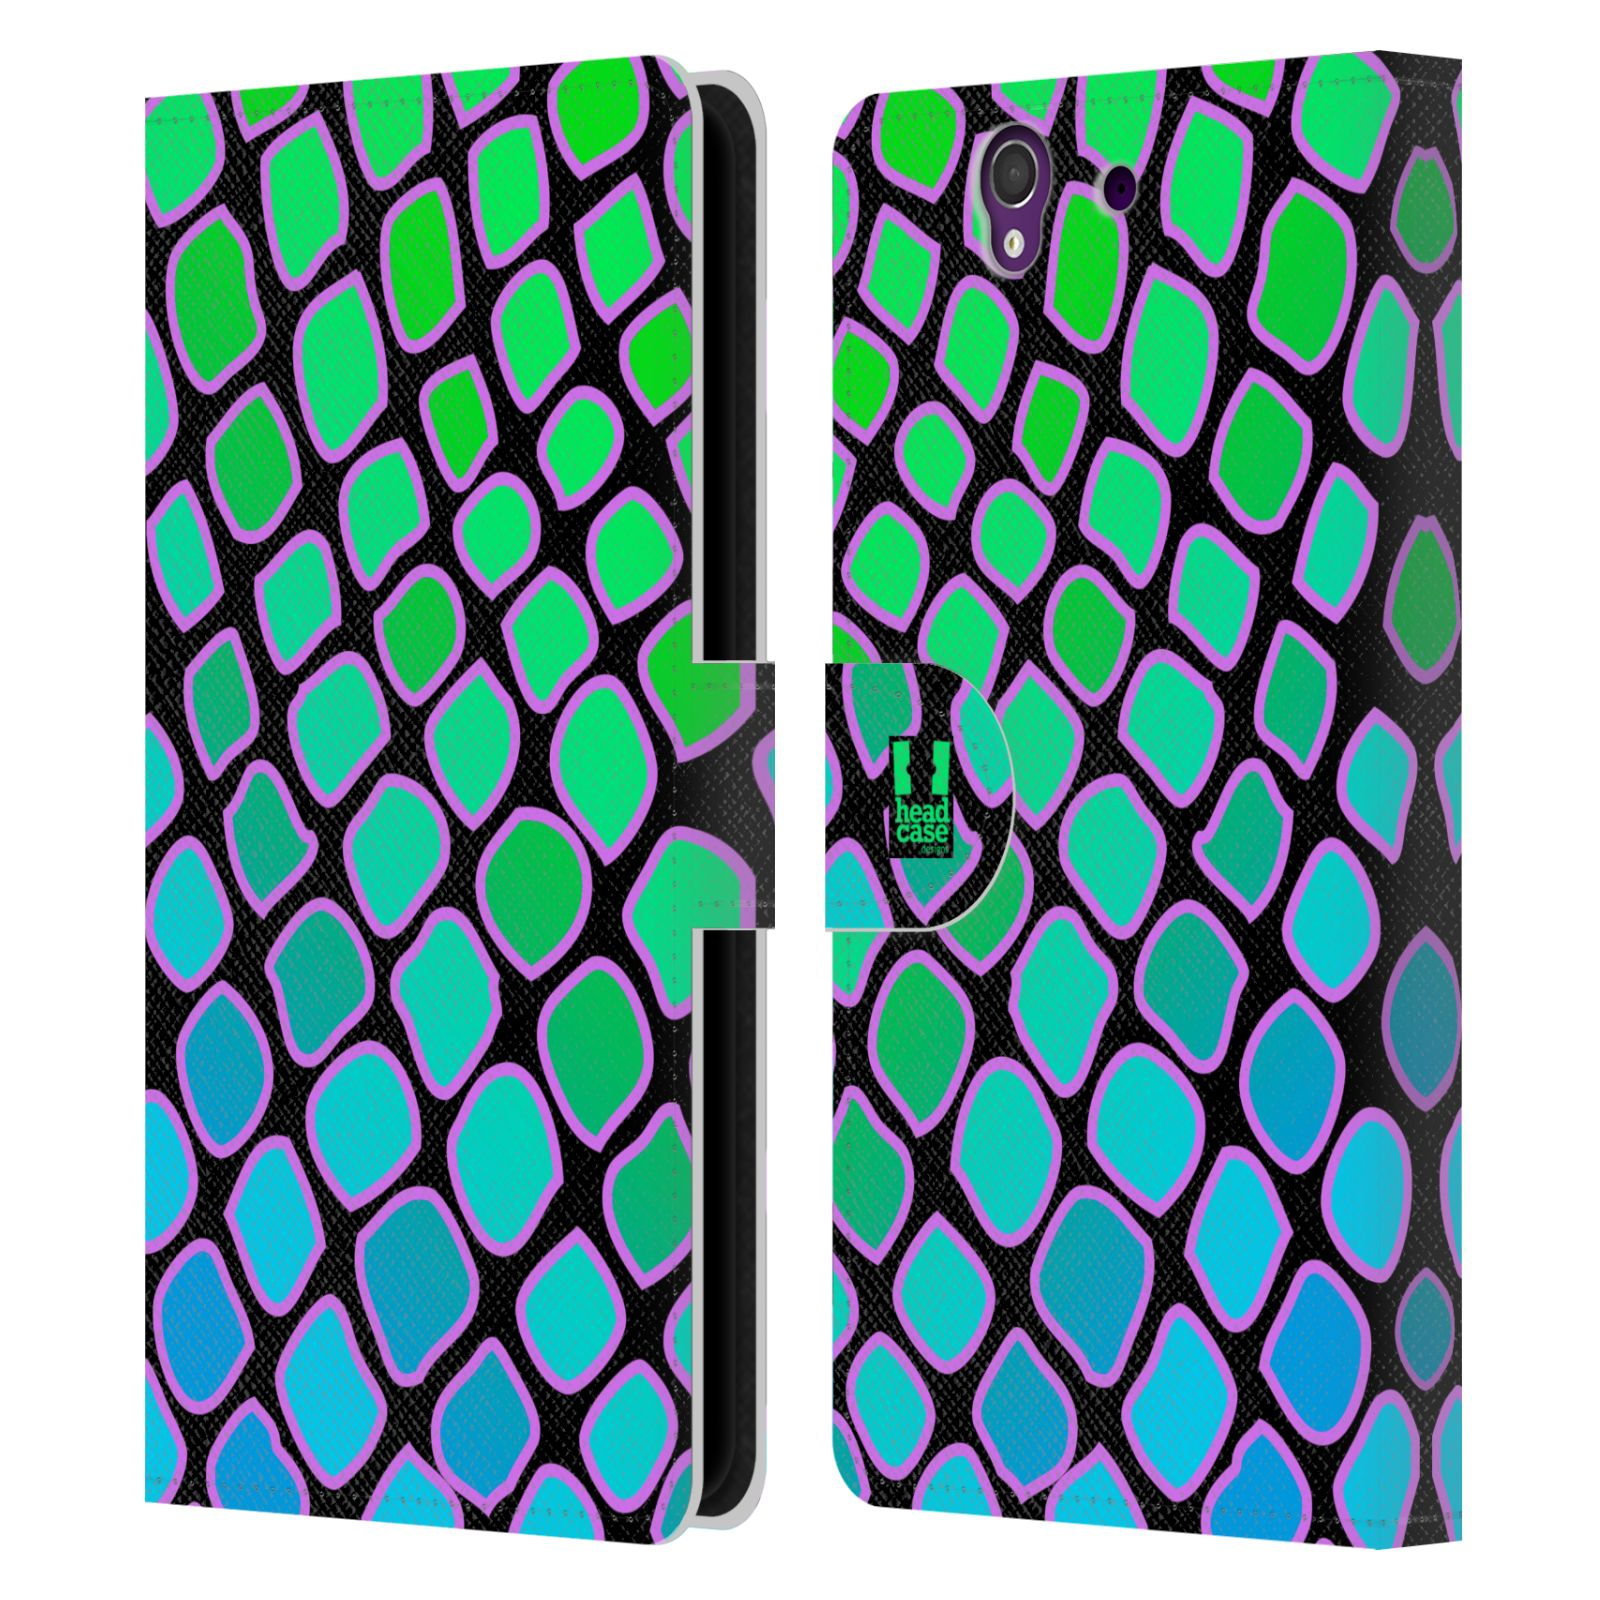 HEAD CASE Flipové pouzdro pro mobil SONY XPERIA Z (C6603) Zvířecí barevné vzory vodní had modrá a zelená barva AQUA